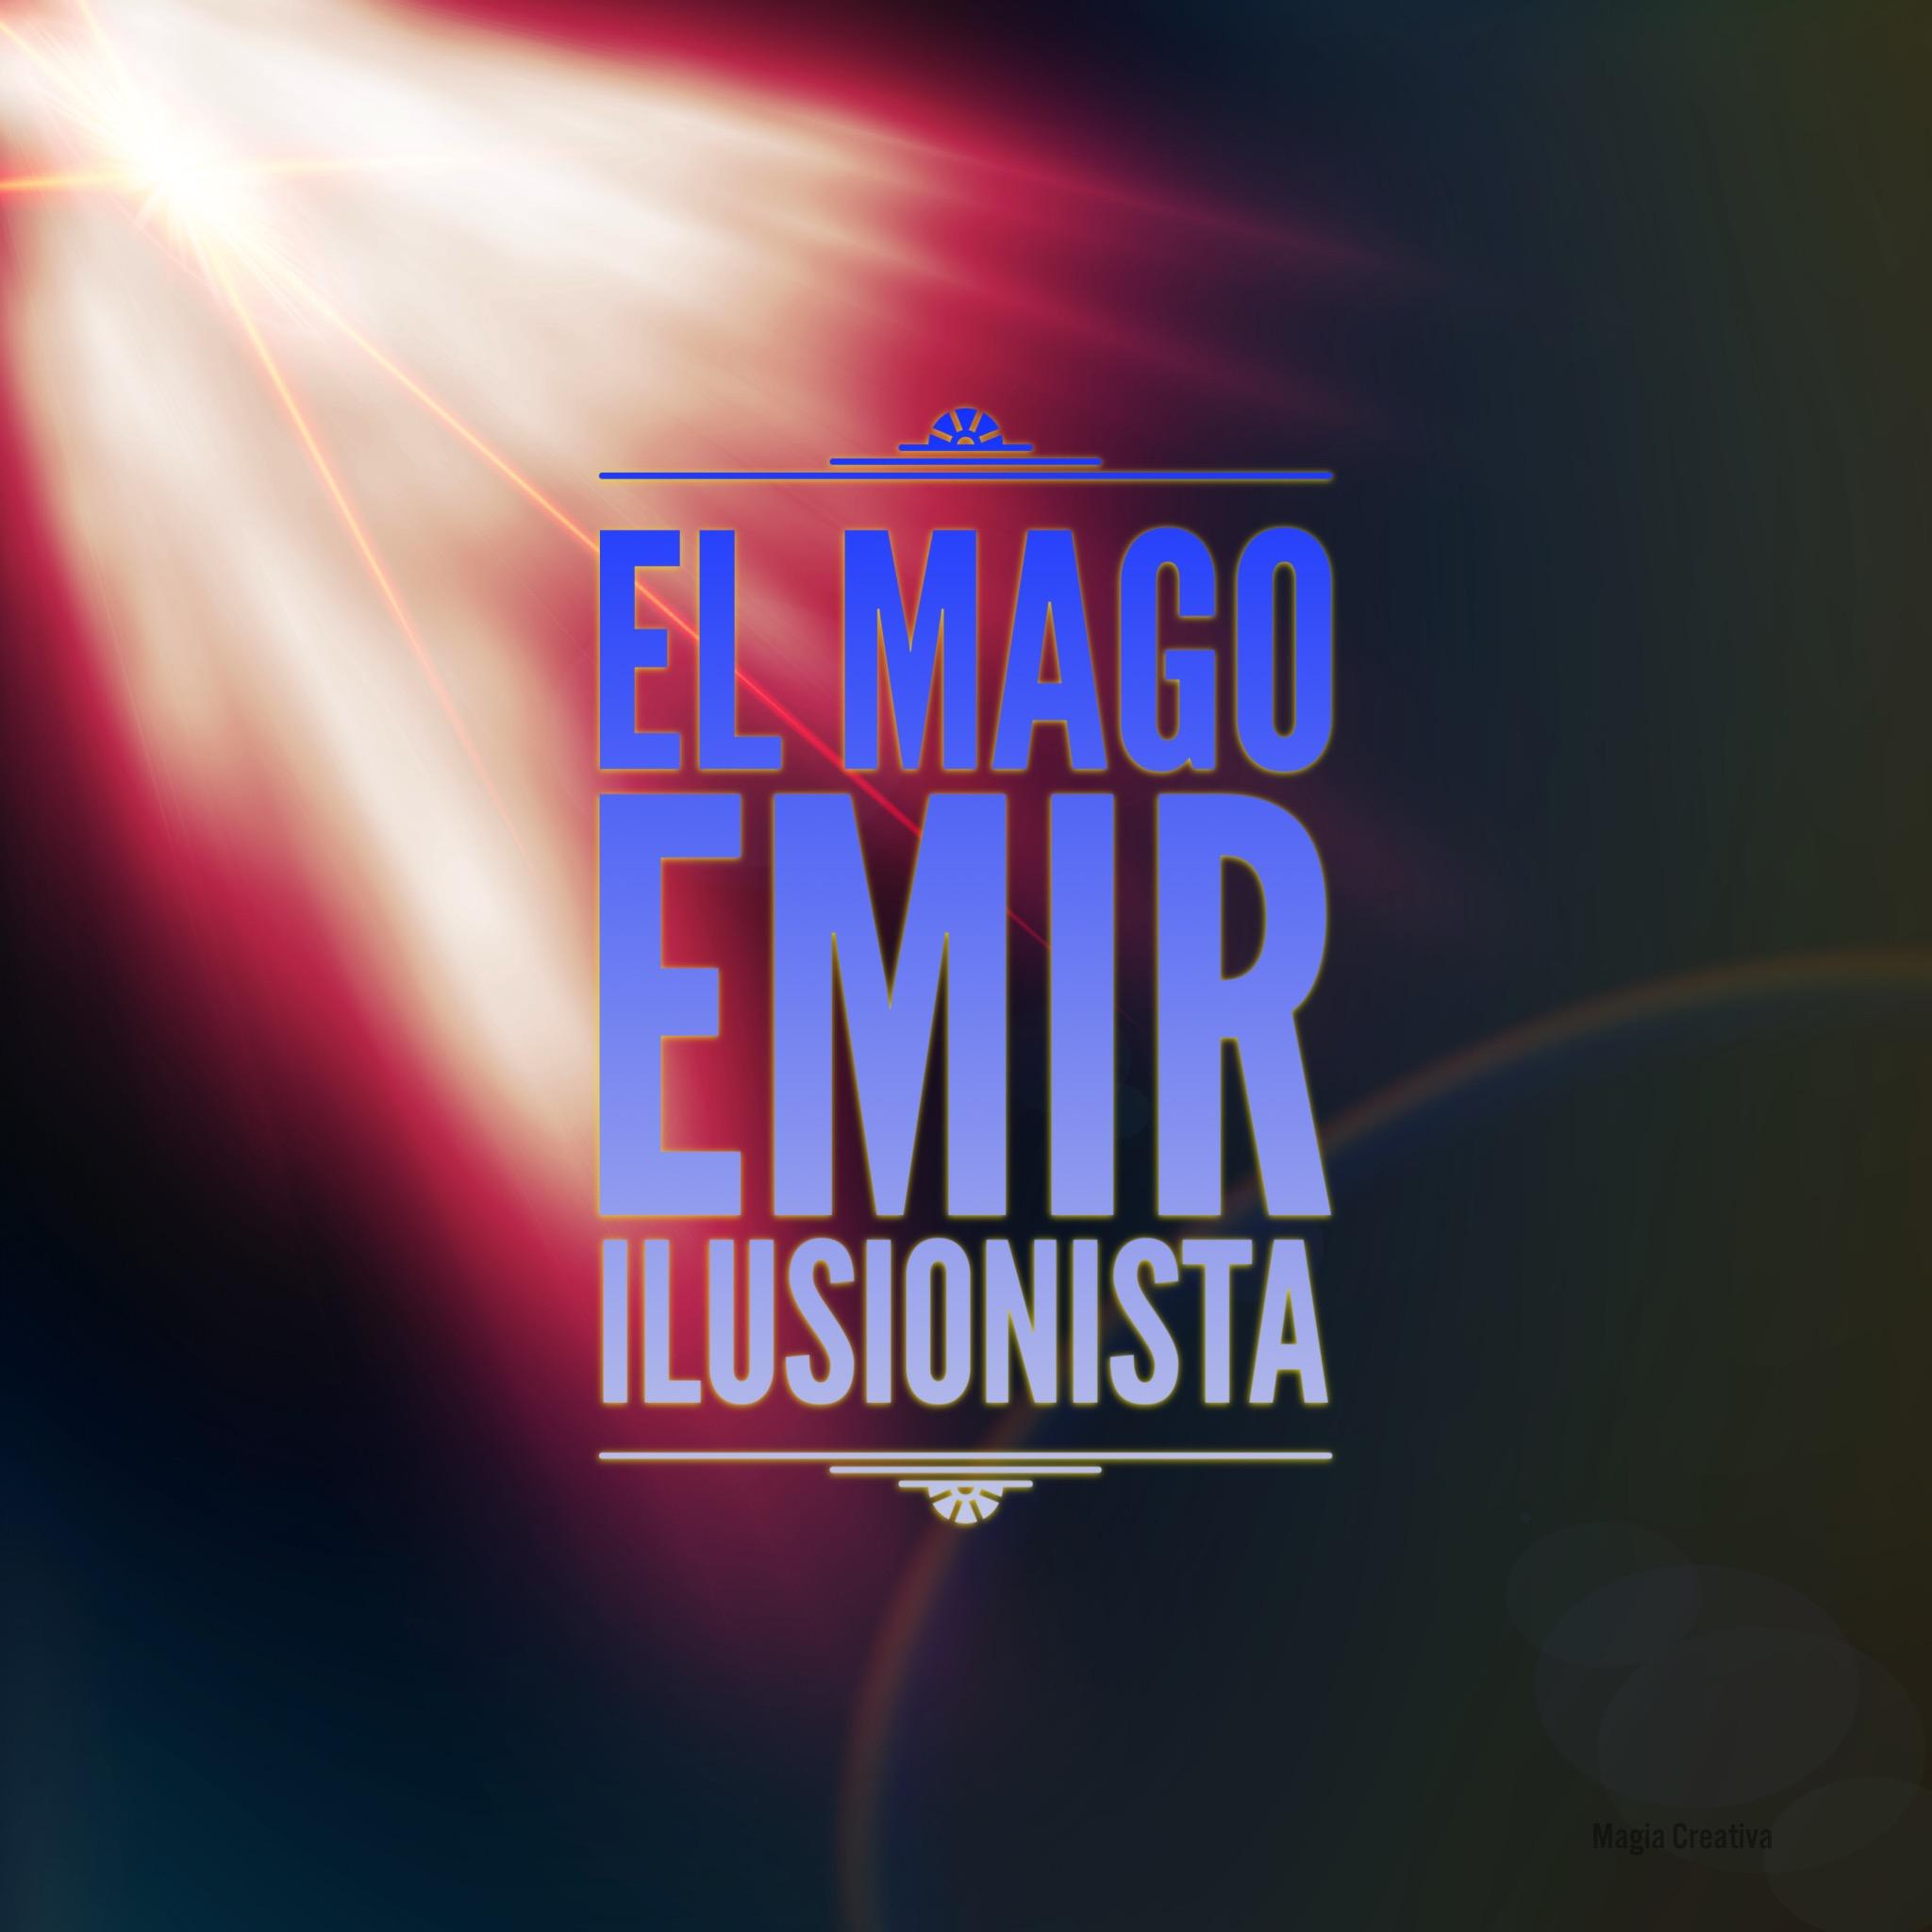 El Mago Emir